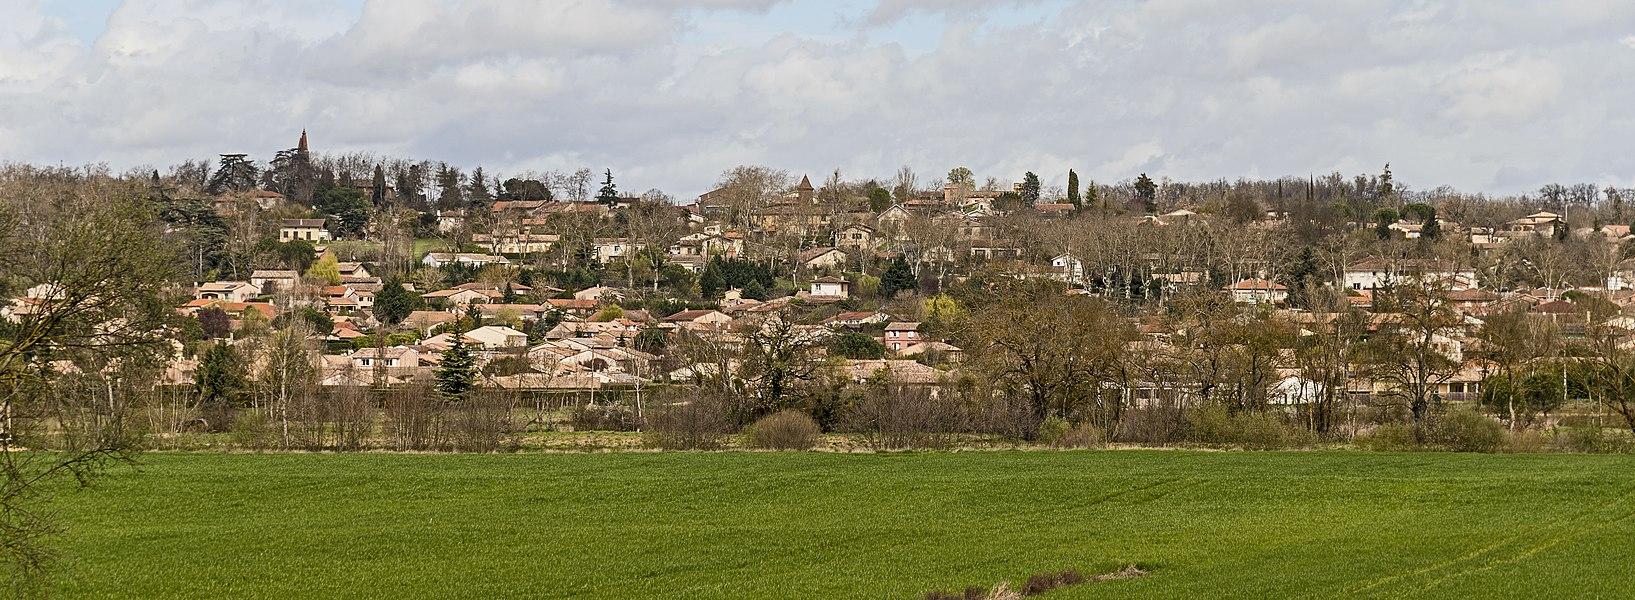 English:  Garidech, Haute-Garonne, France. South exposure.